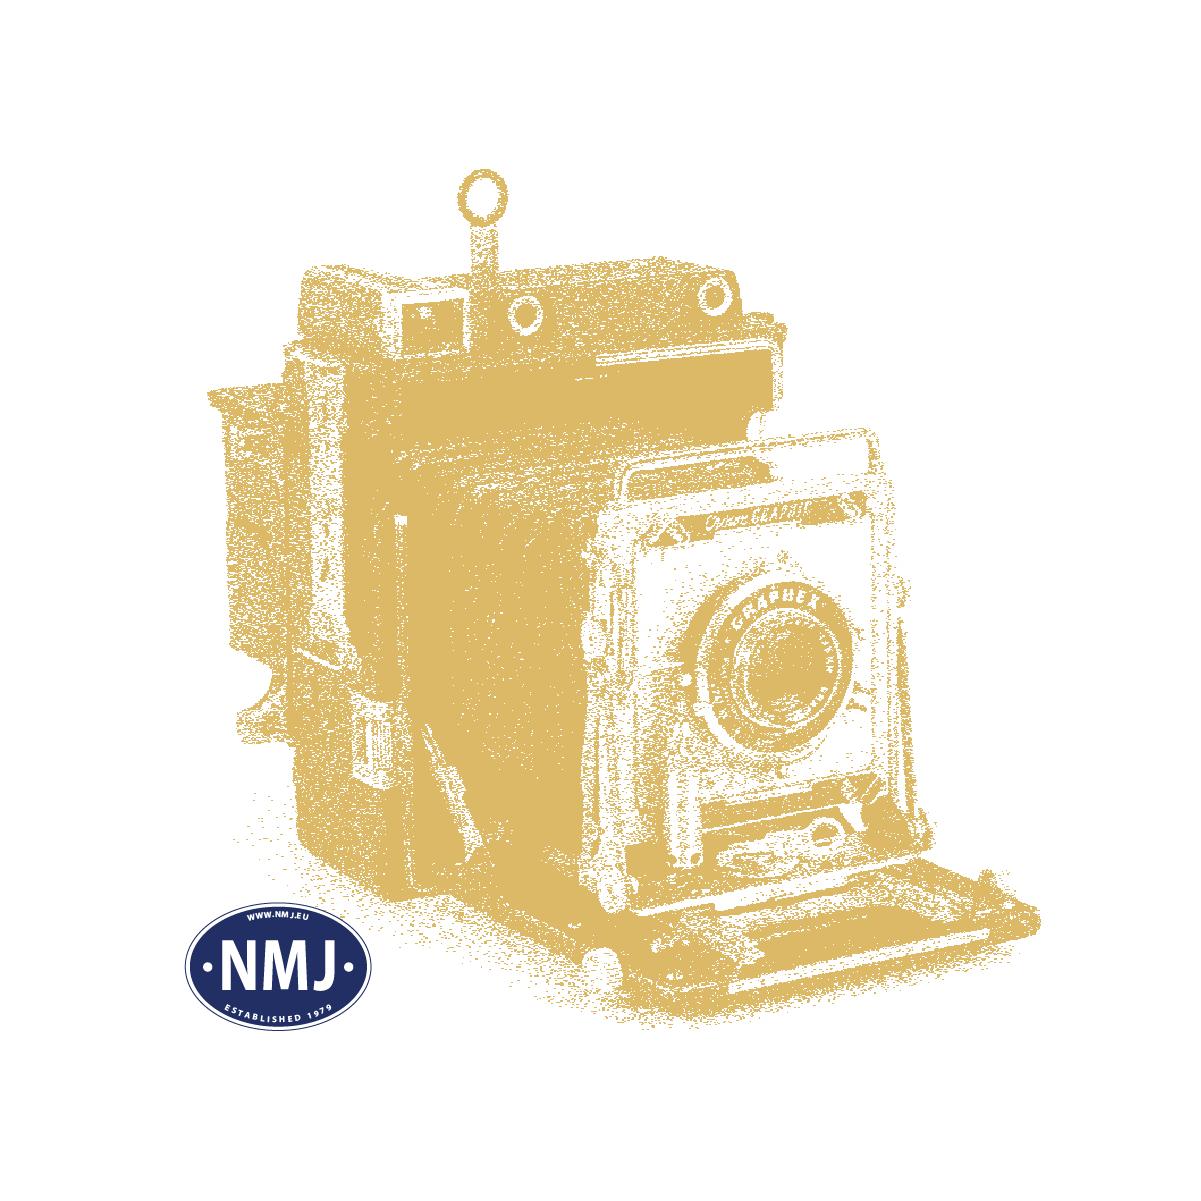 NMJT93103 - NMJ Topline NSB El14 2181, Mellomdesign, DC